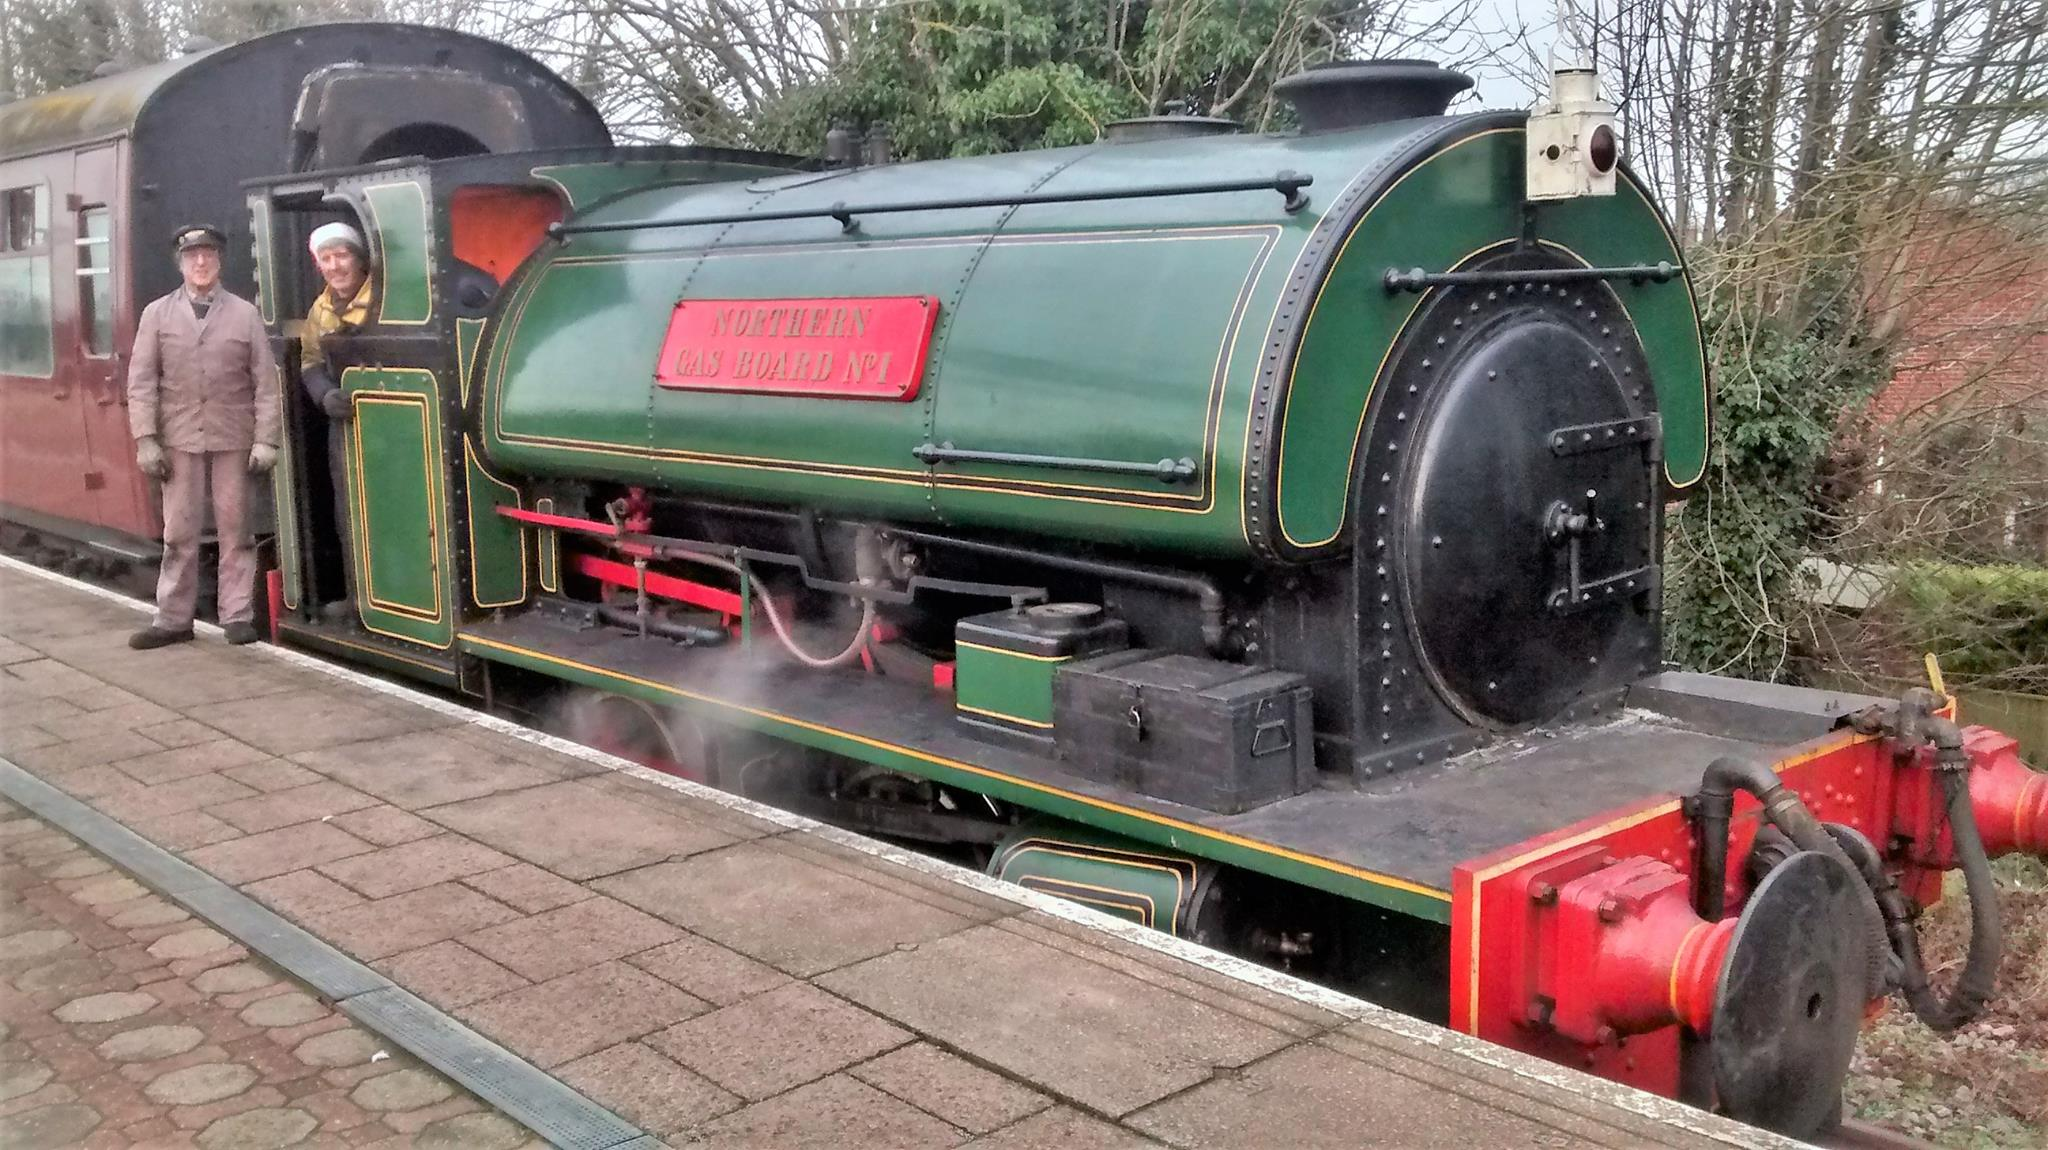 Cholsey & Wallingford Railway